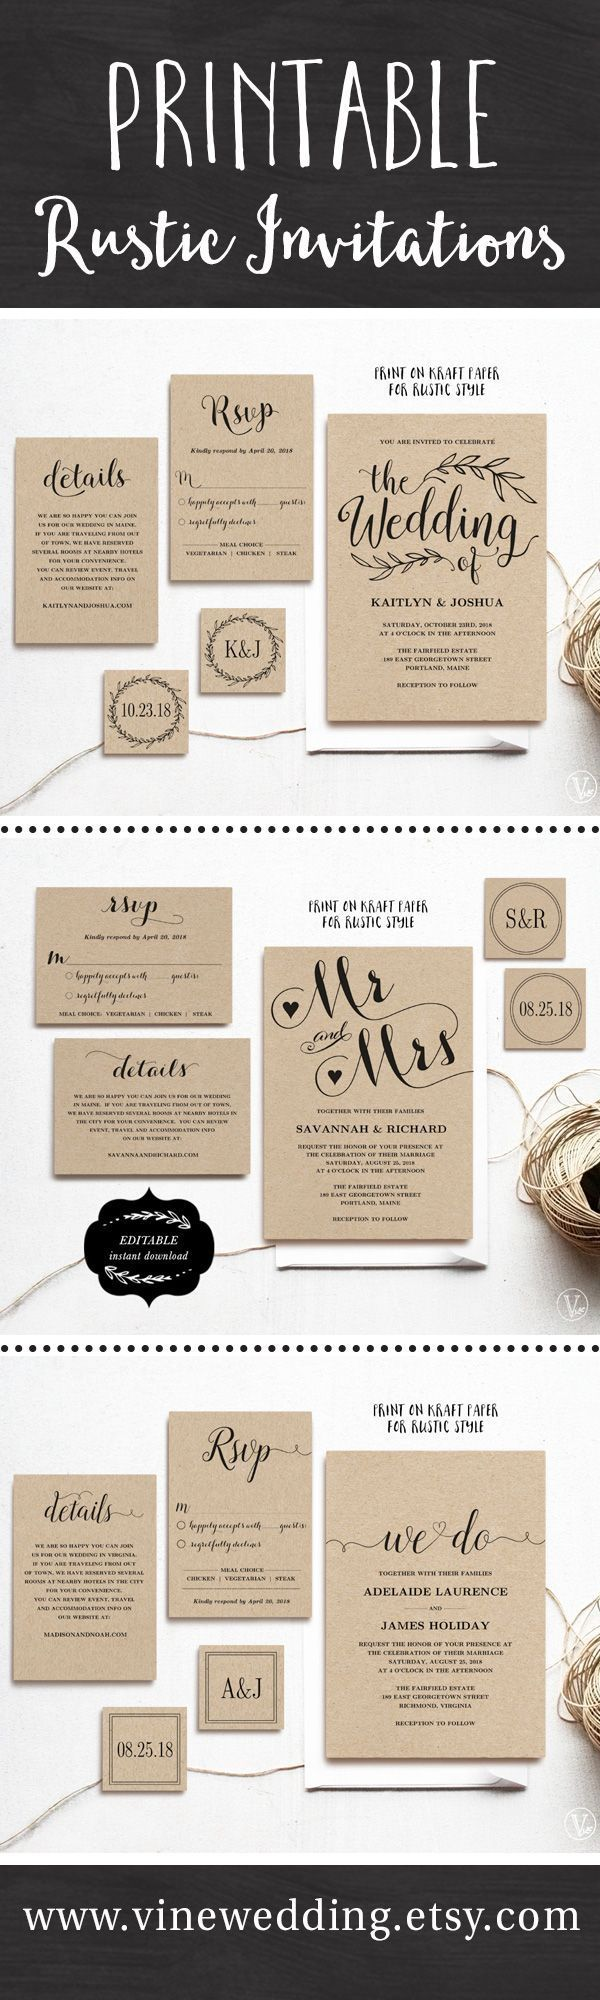 diy wedding invitations elegant%0A nice diy wedding invitations best photos